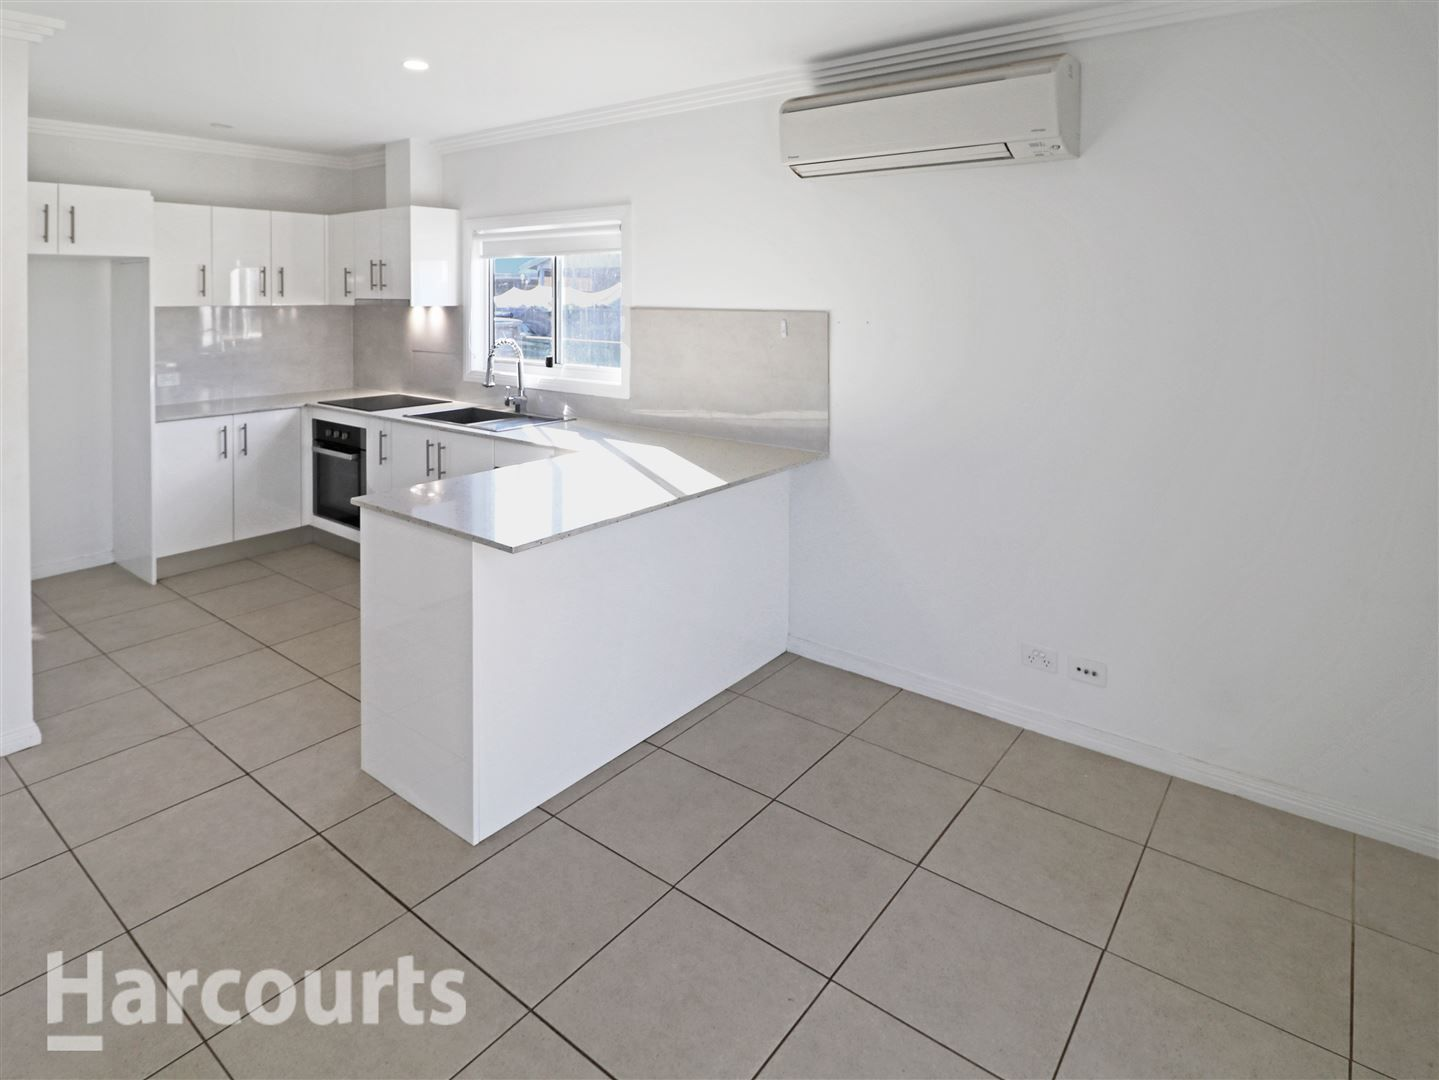 15a Birdwood Avenue (Leased by Harcourts), Umina Beach NSW 2257, Image 1